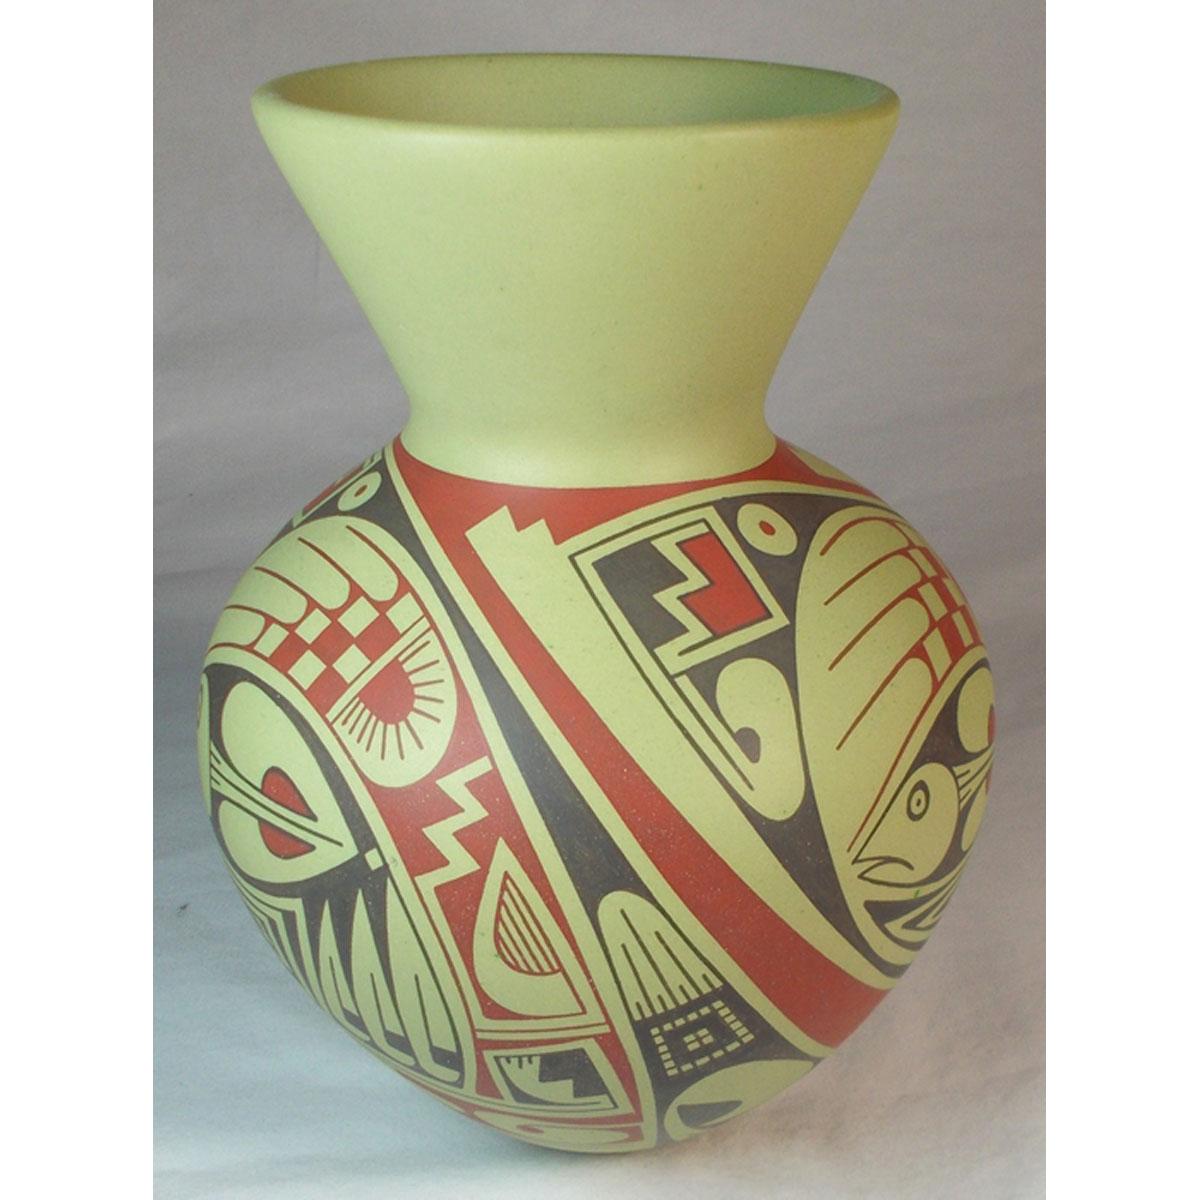 Mata Ortiz Pottery, Chihuahua Rodrigo Perez Mata Ortiz Pottery